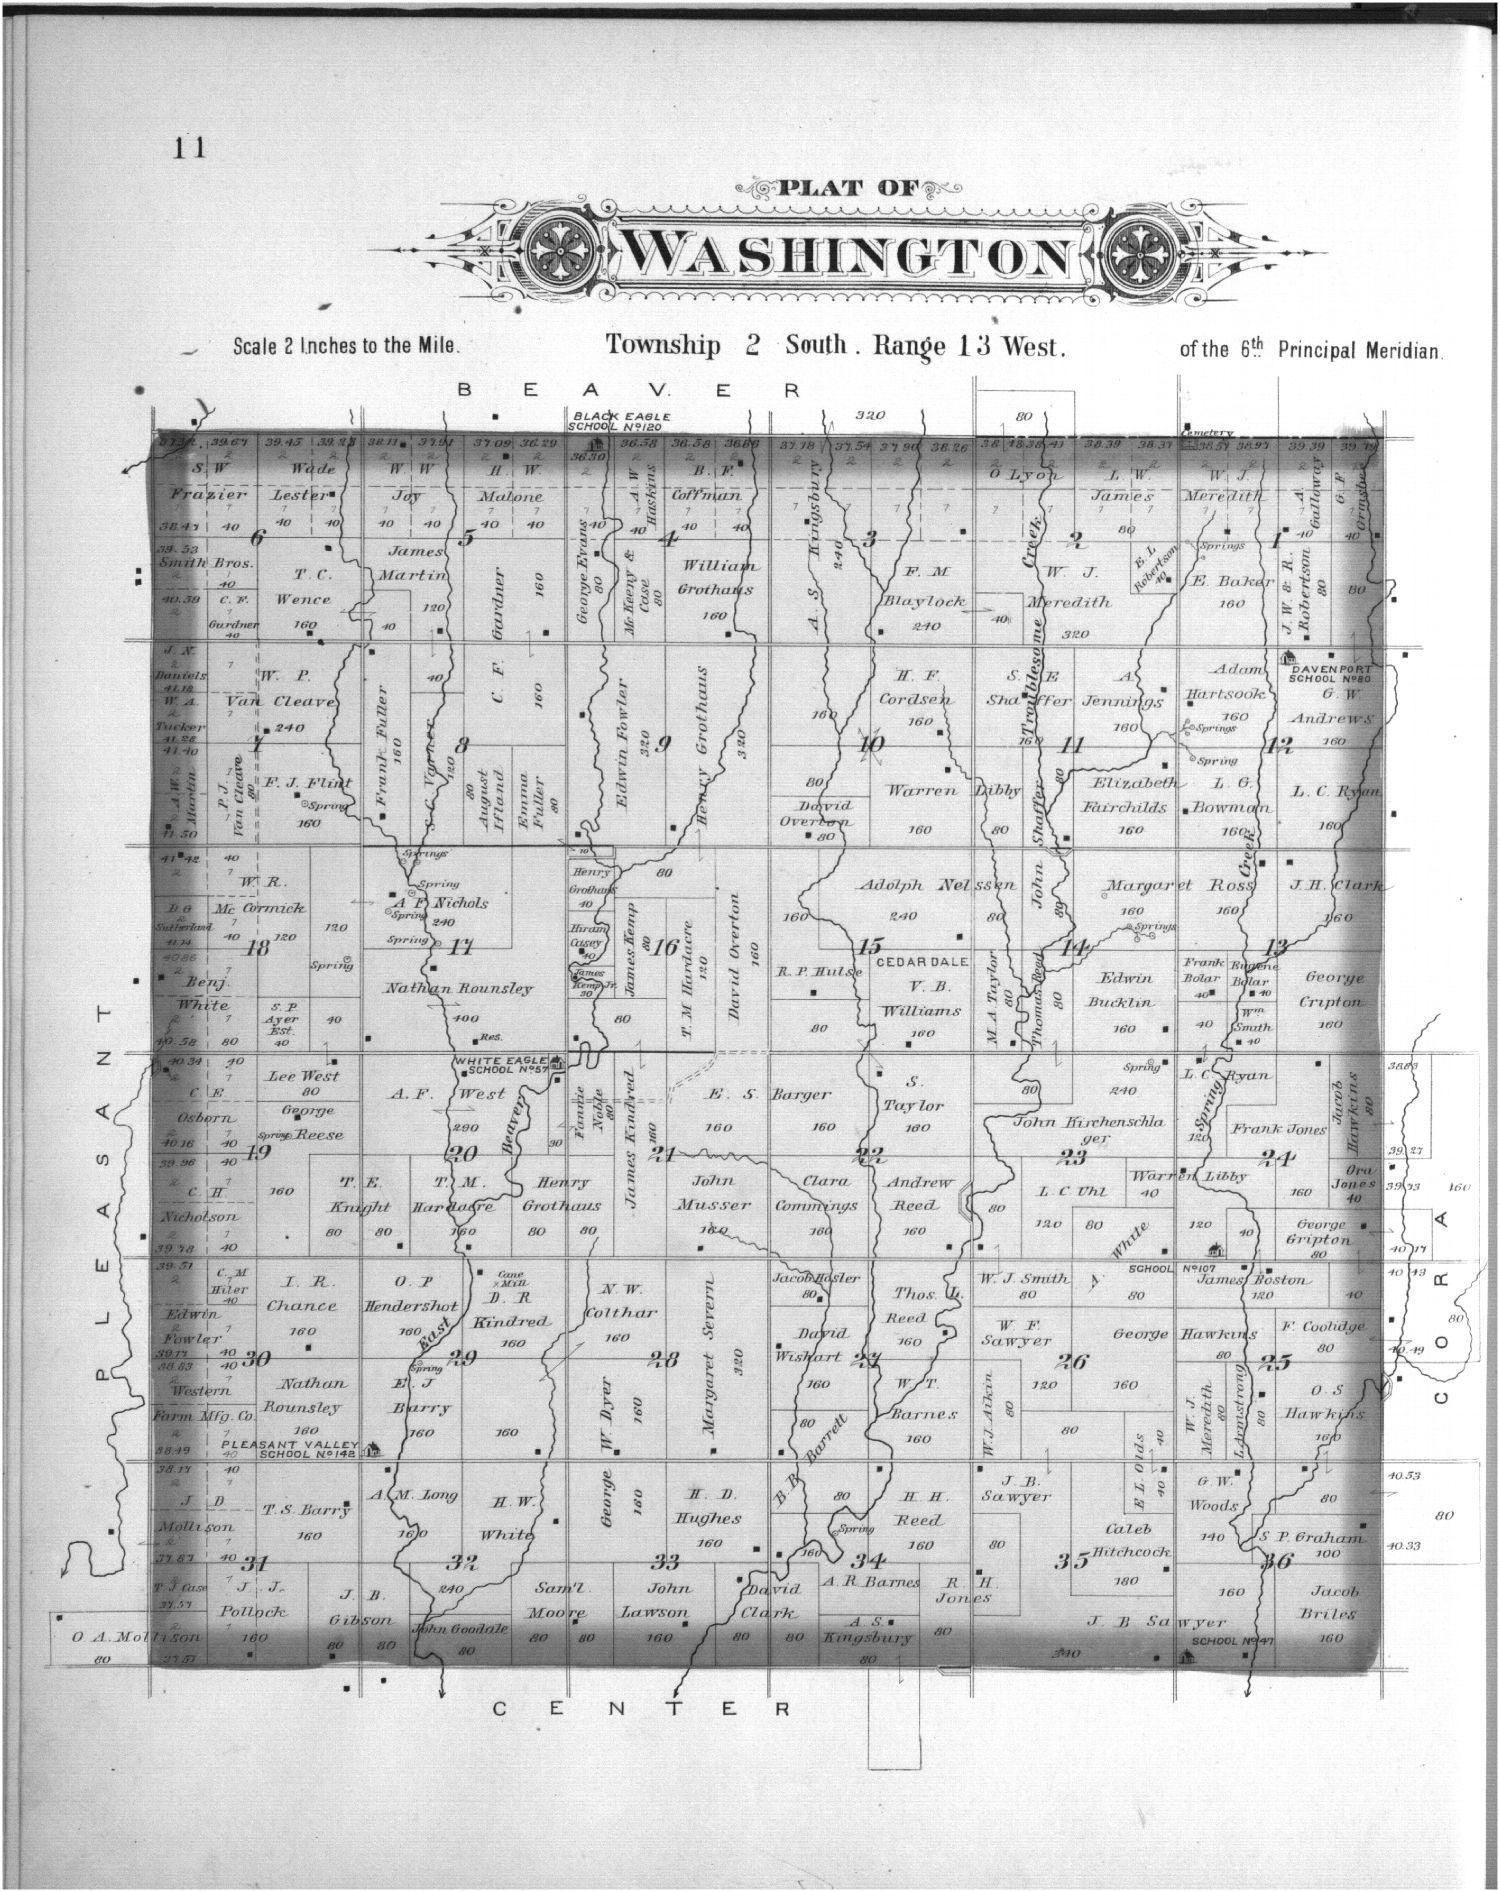 Plat book, Smith County, Kansas - 11